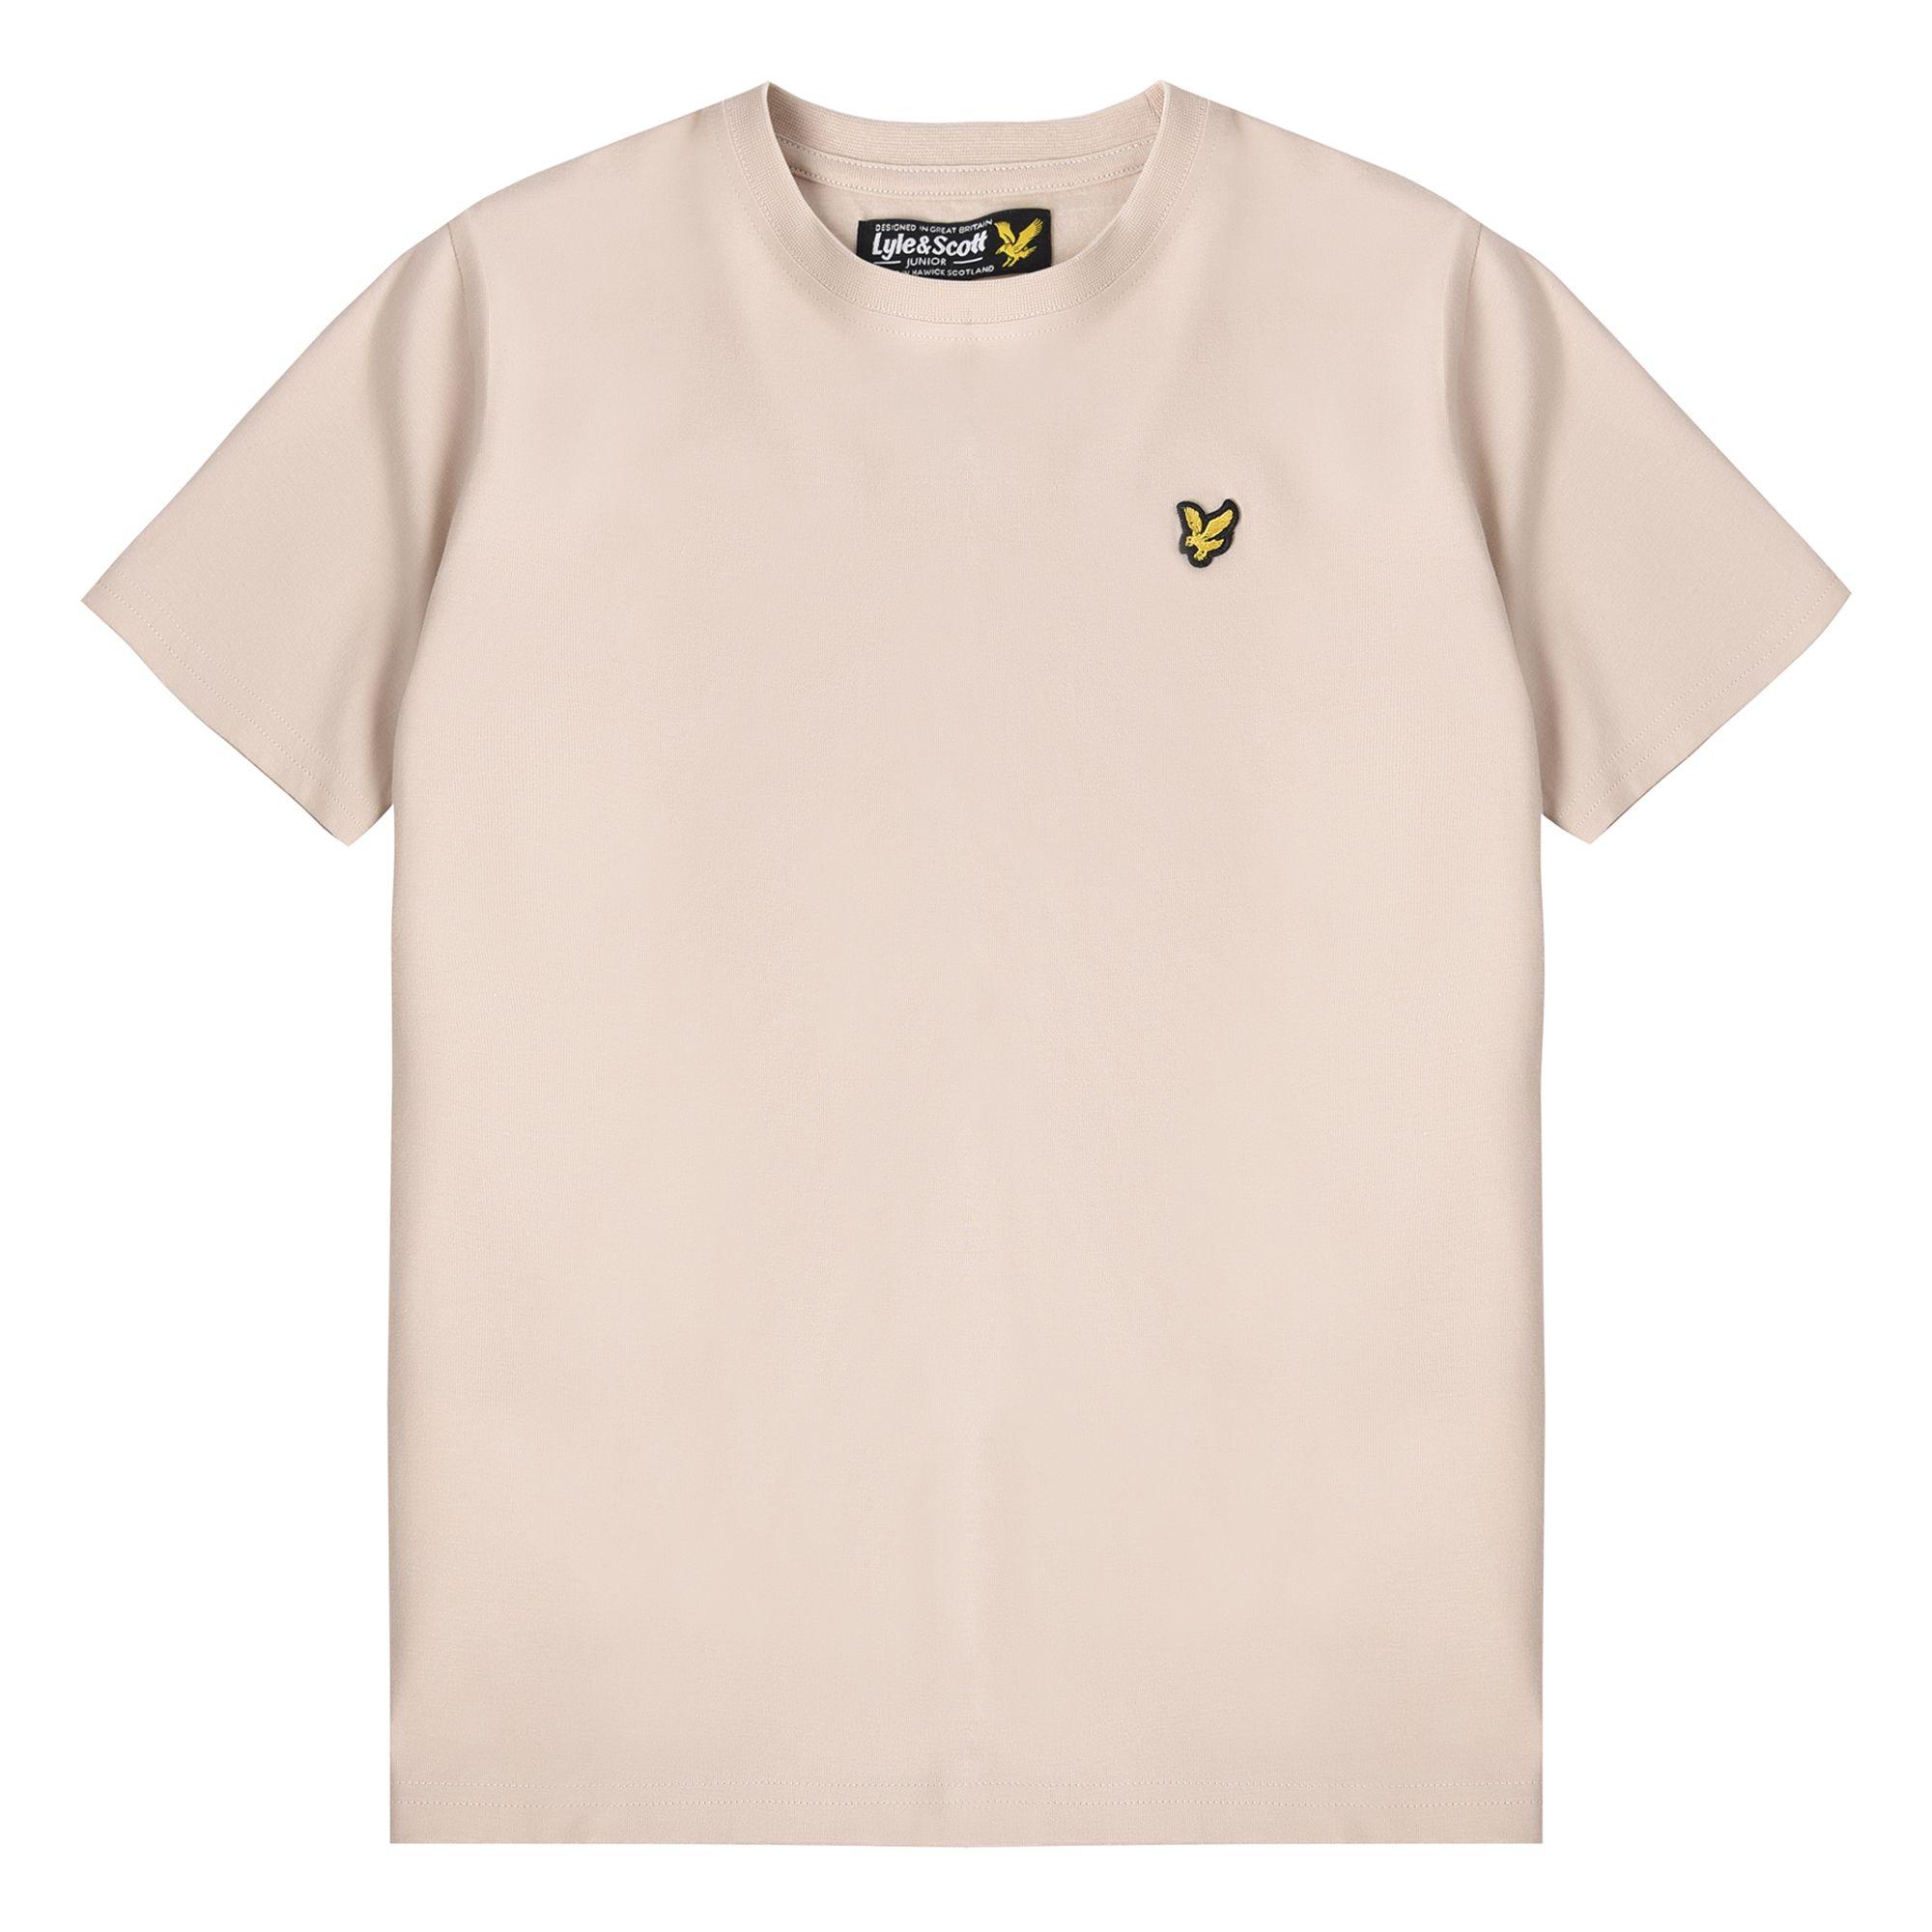 Lyle & Scott Classic T-Shirt Beige